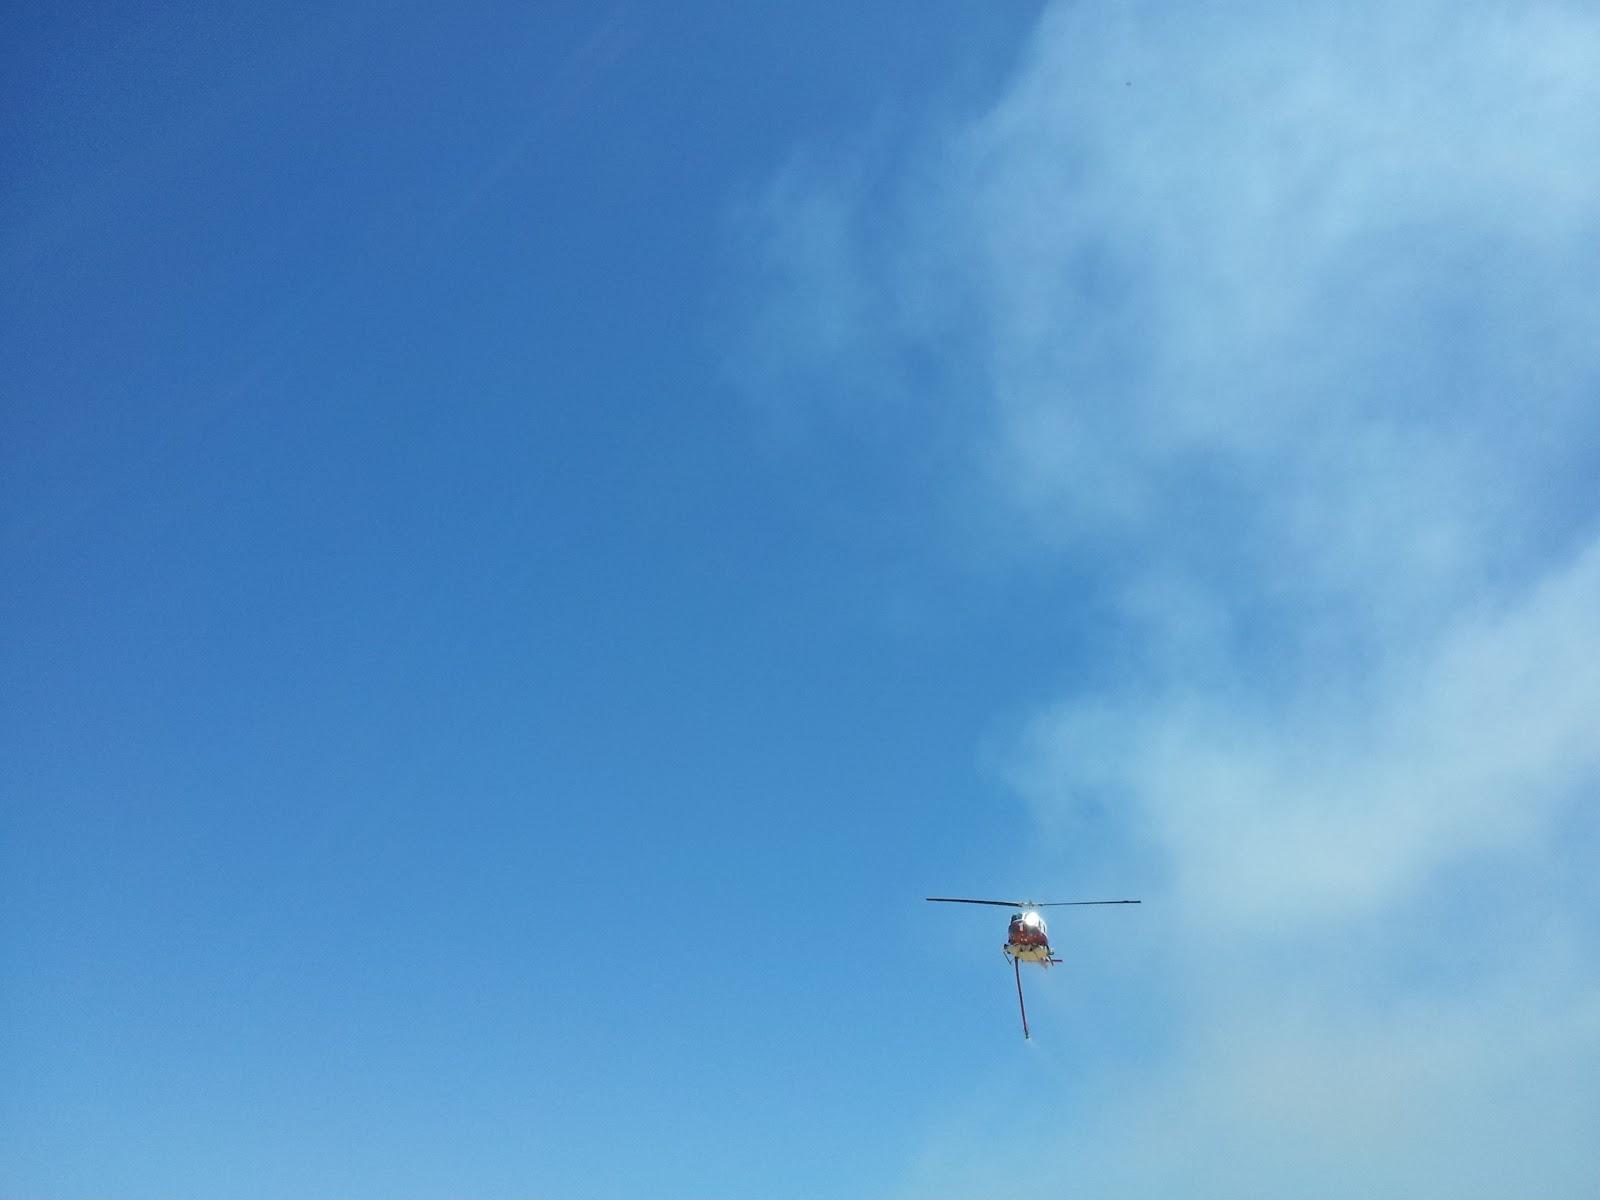 Natomas Ca North Area Grass Fire Burns Near Airport The Natomas Buzz